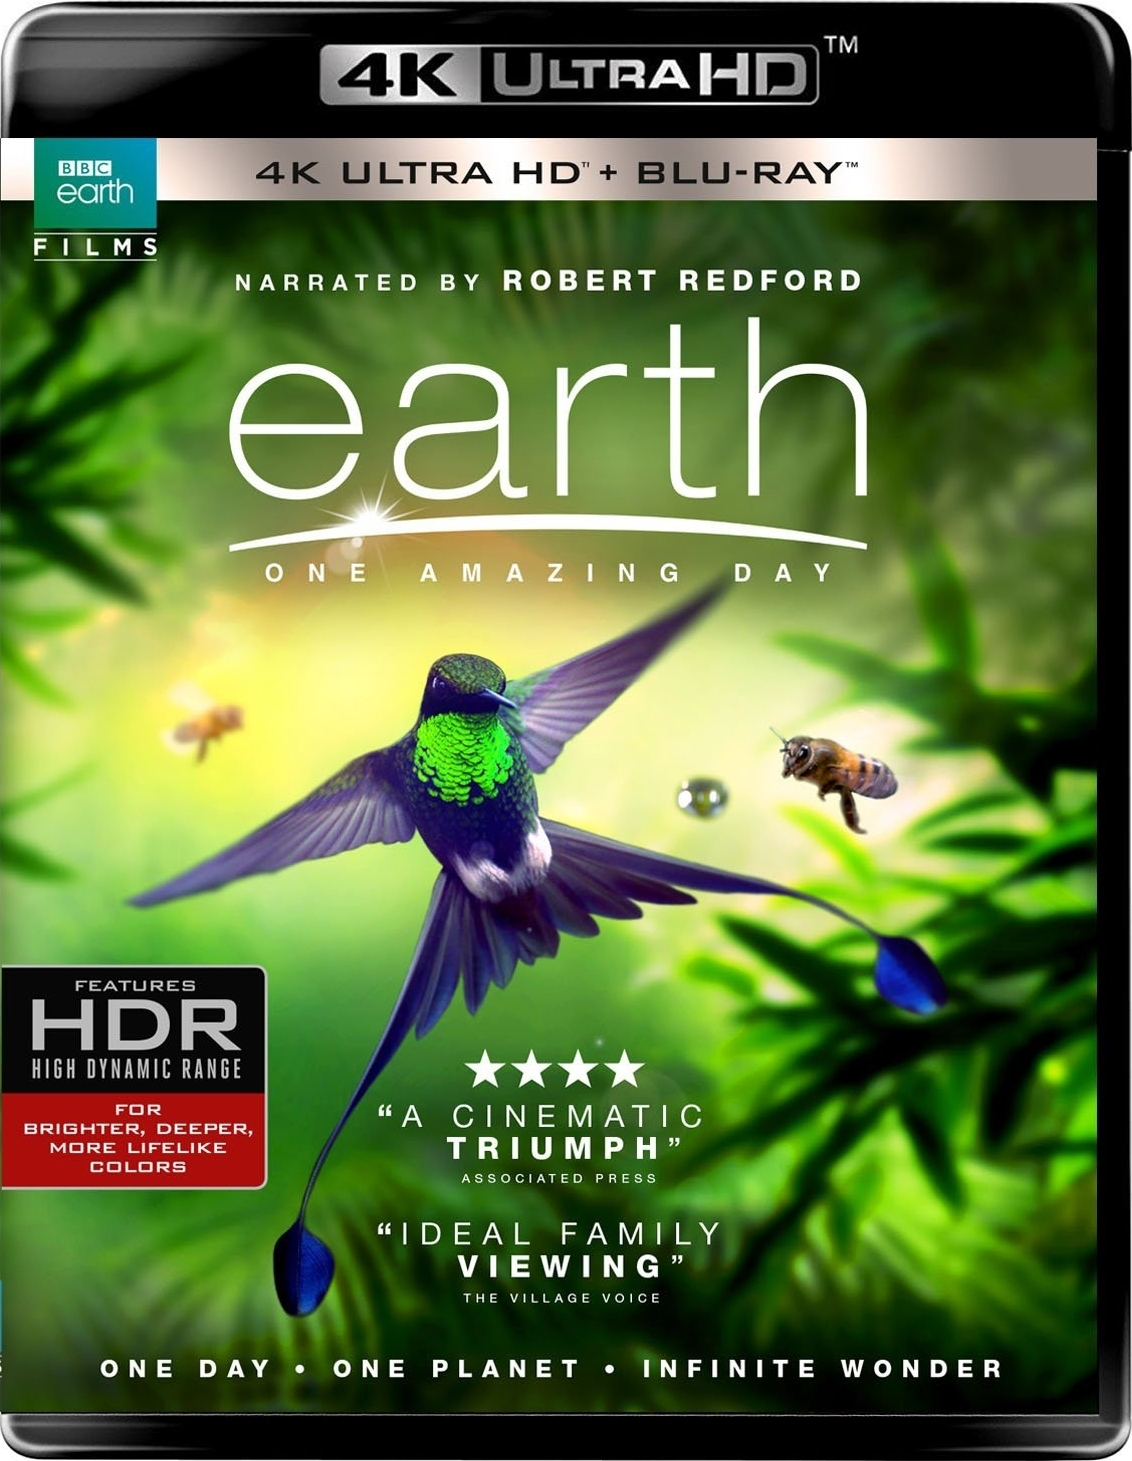 Earth: One Amazing Day 4K (2017) Ultra HD Blu-ray